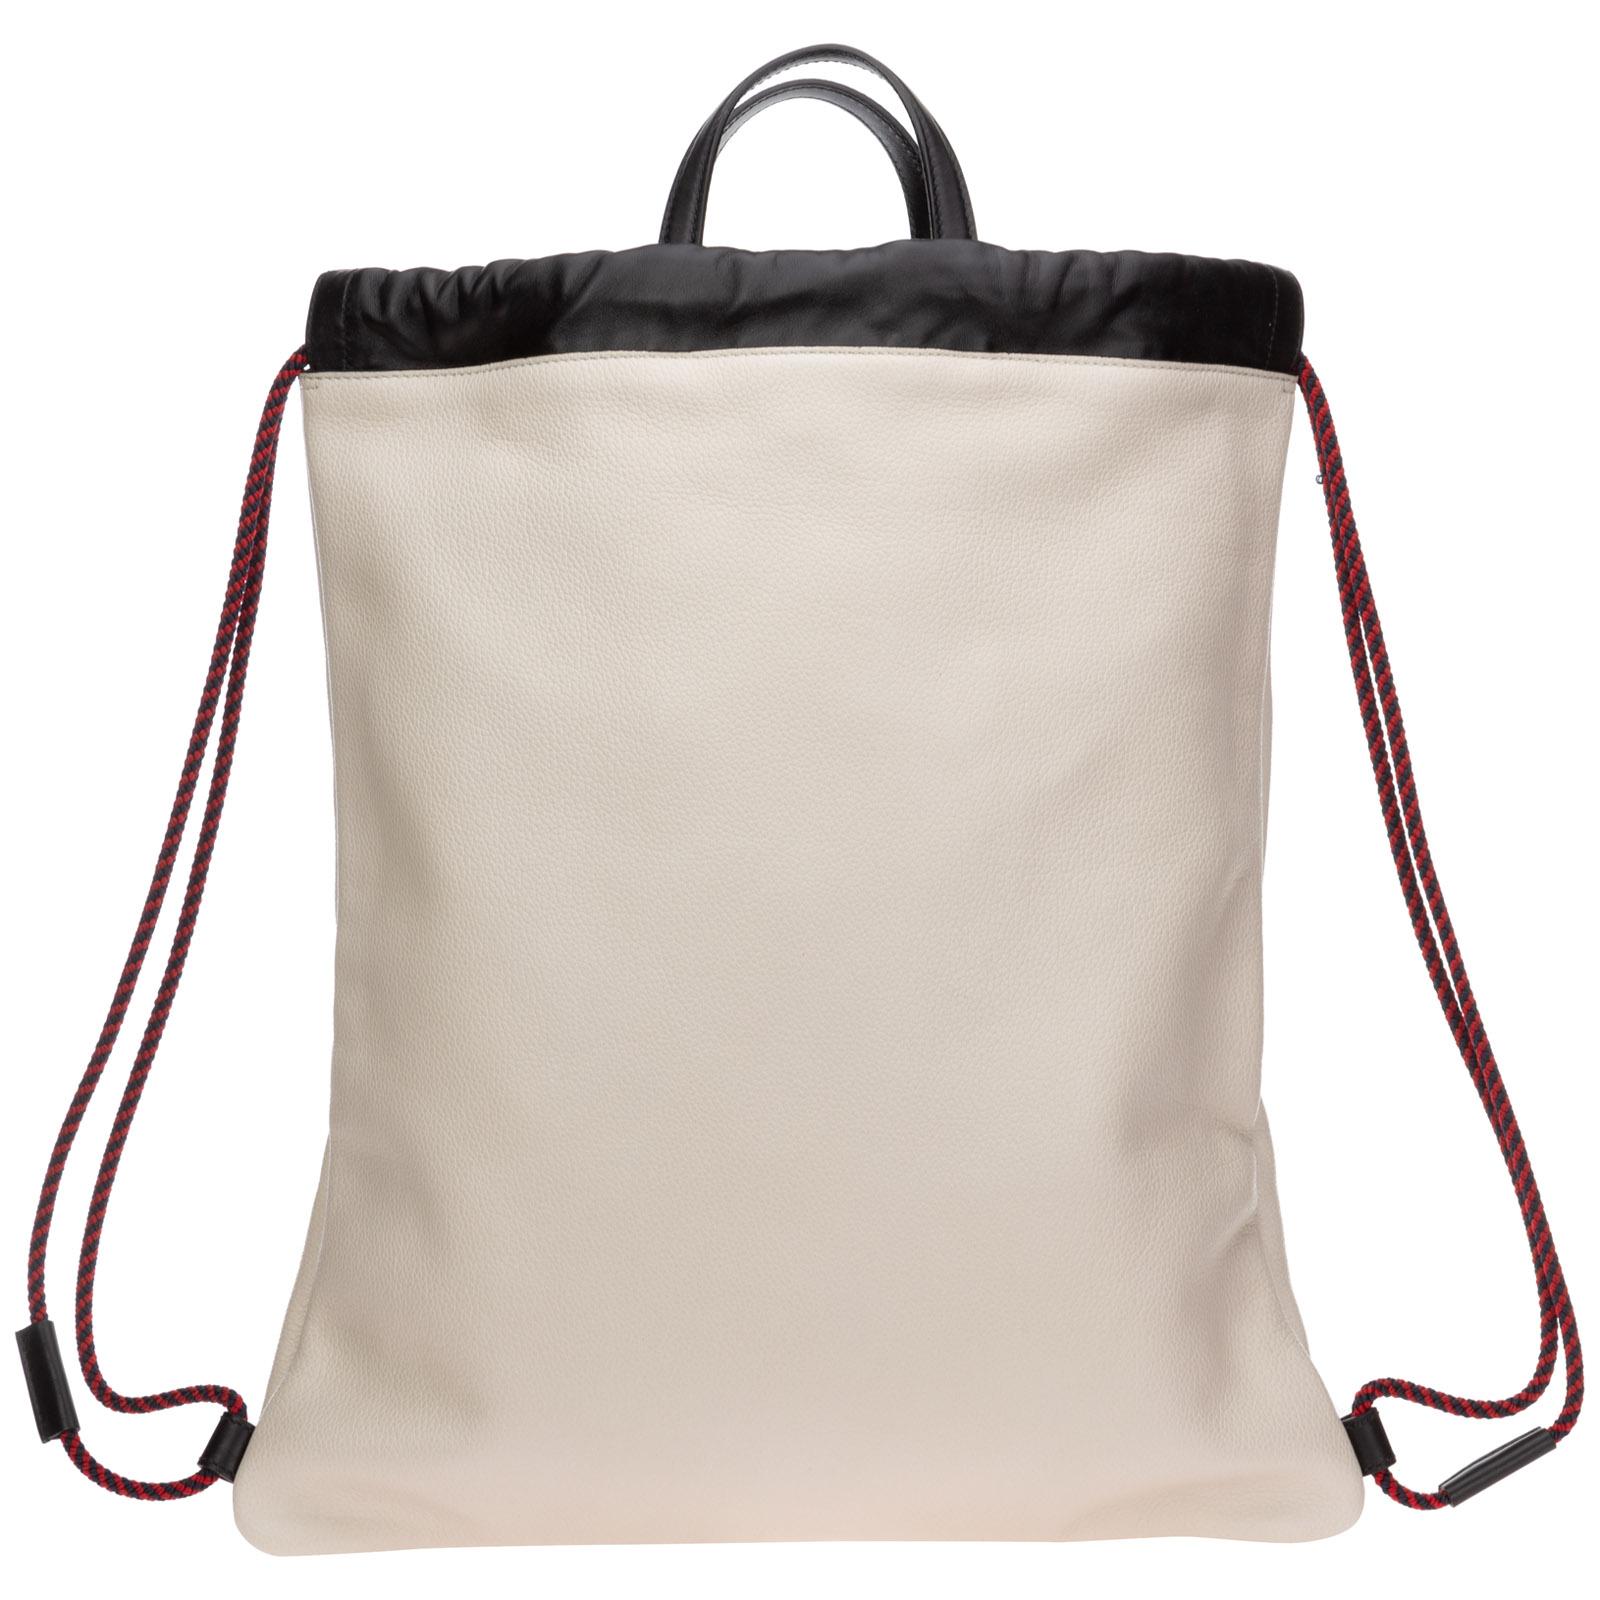 Men's leather rucksack backpack travel